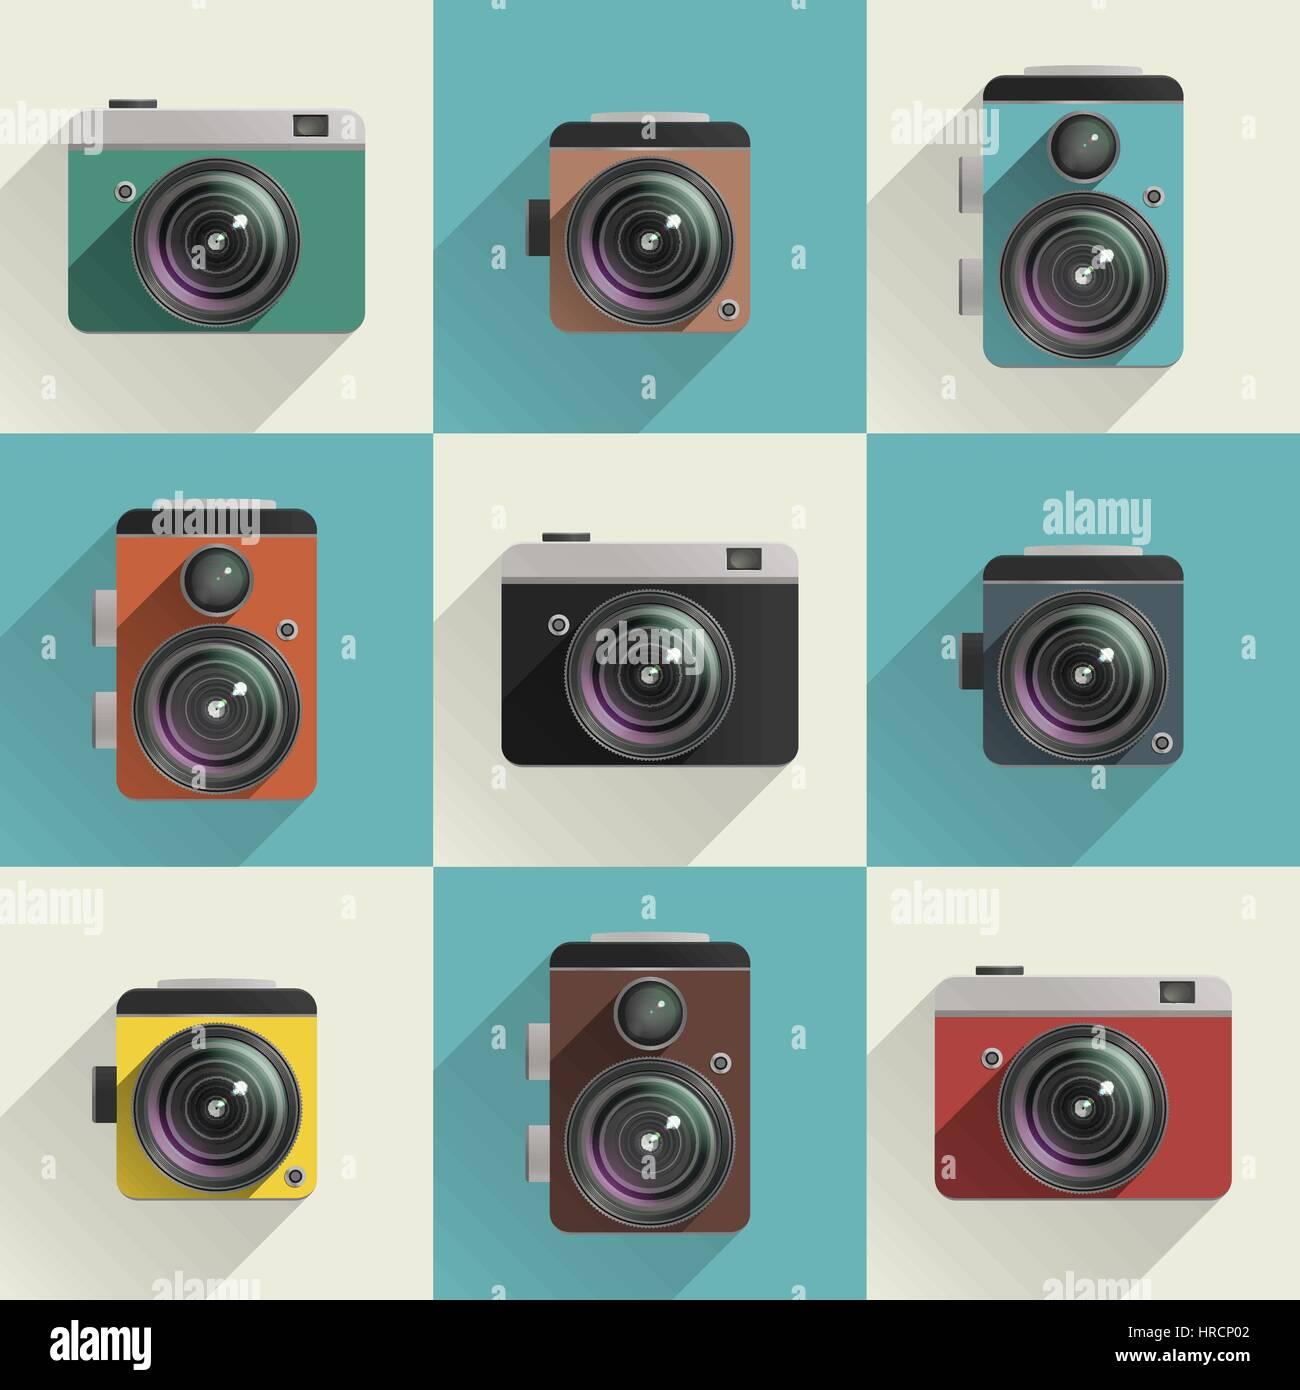 Camera icons Stock Vector